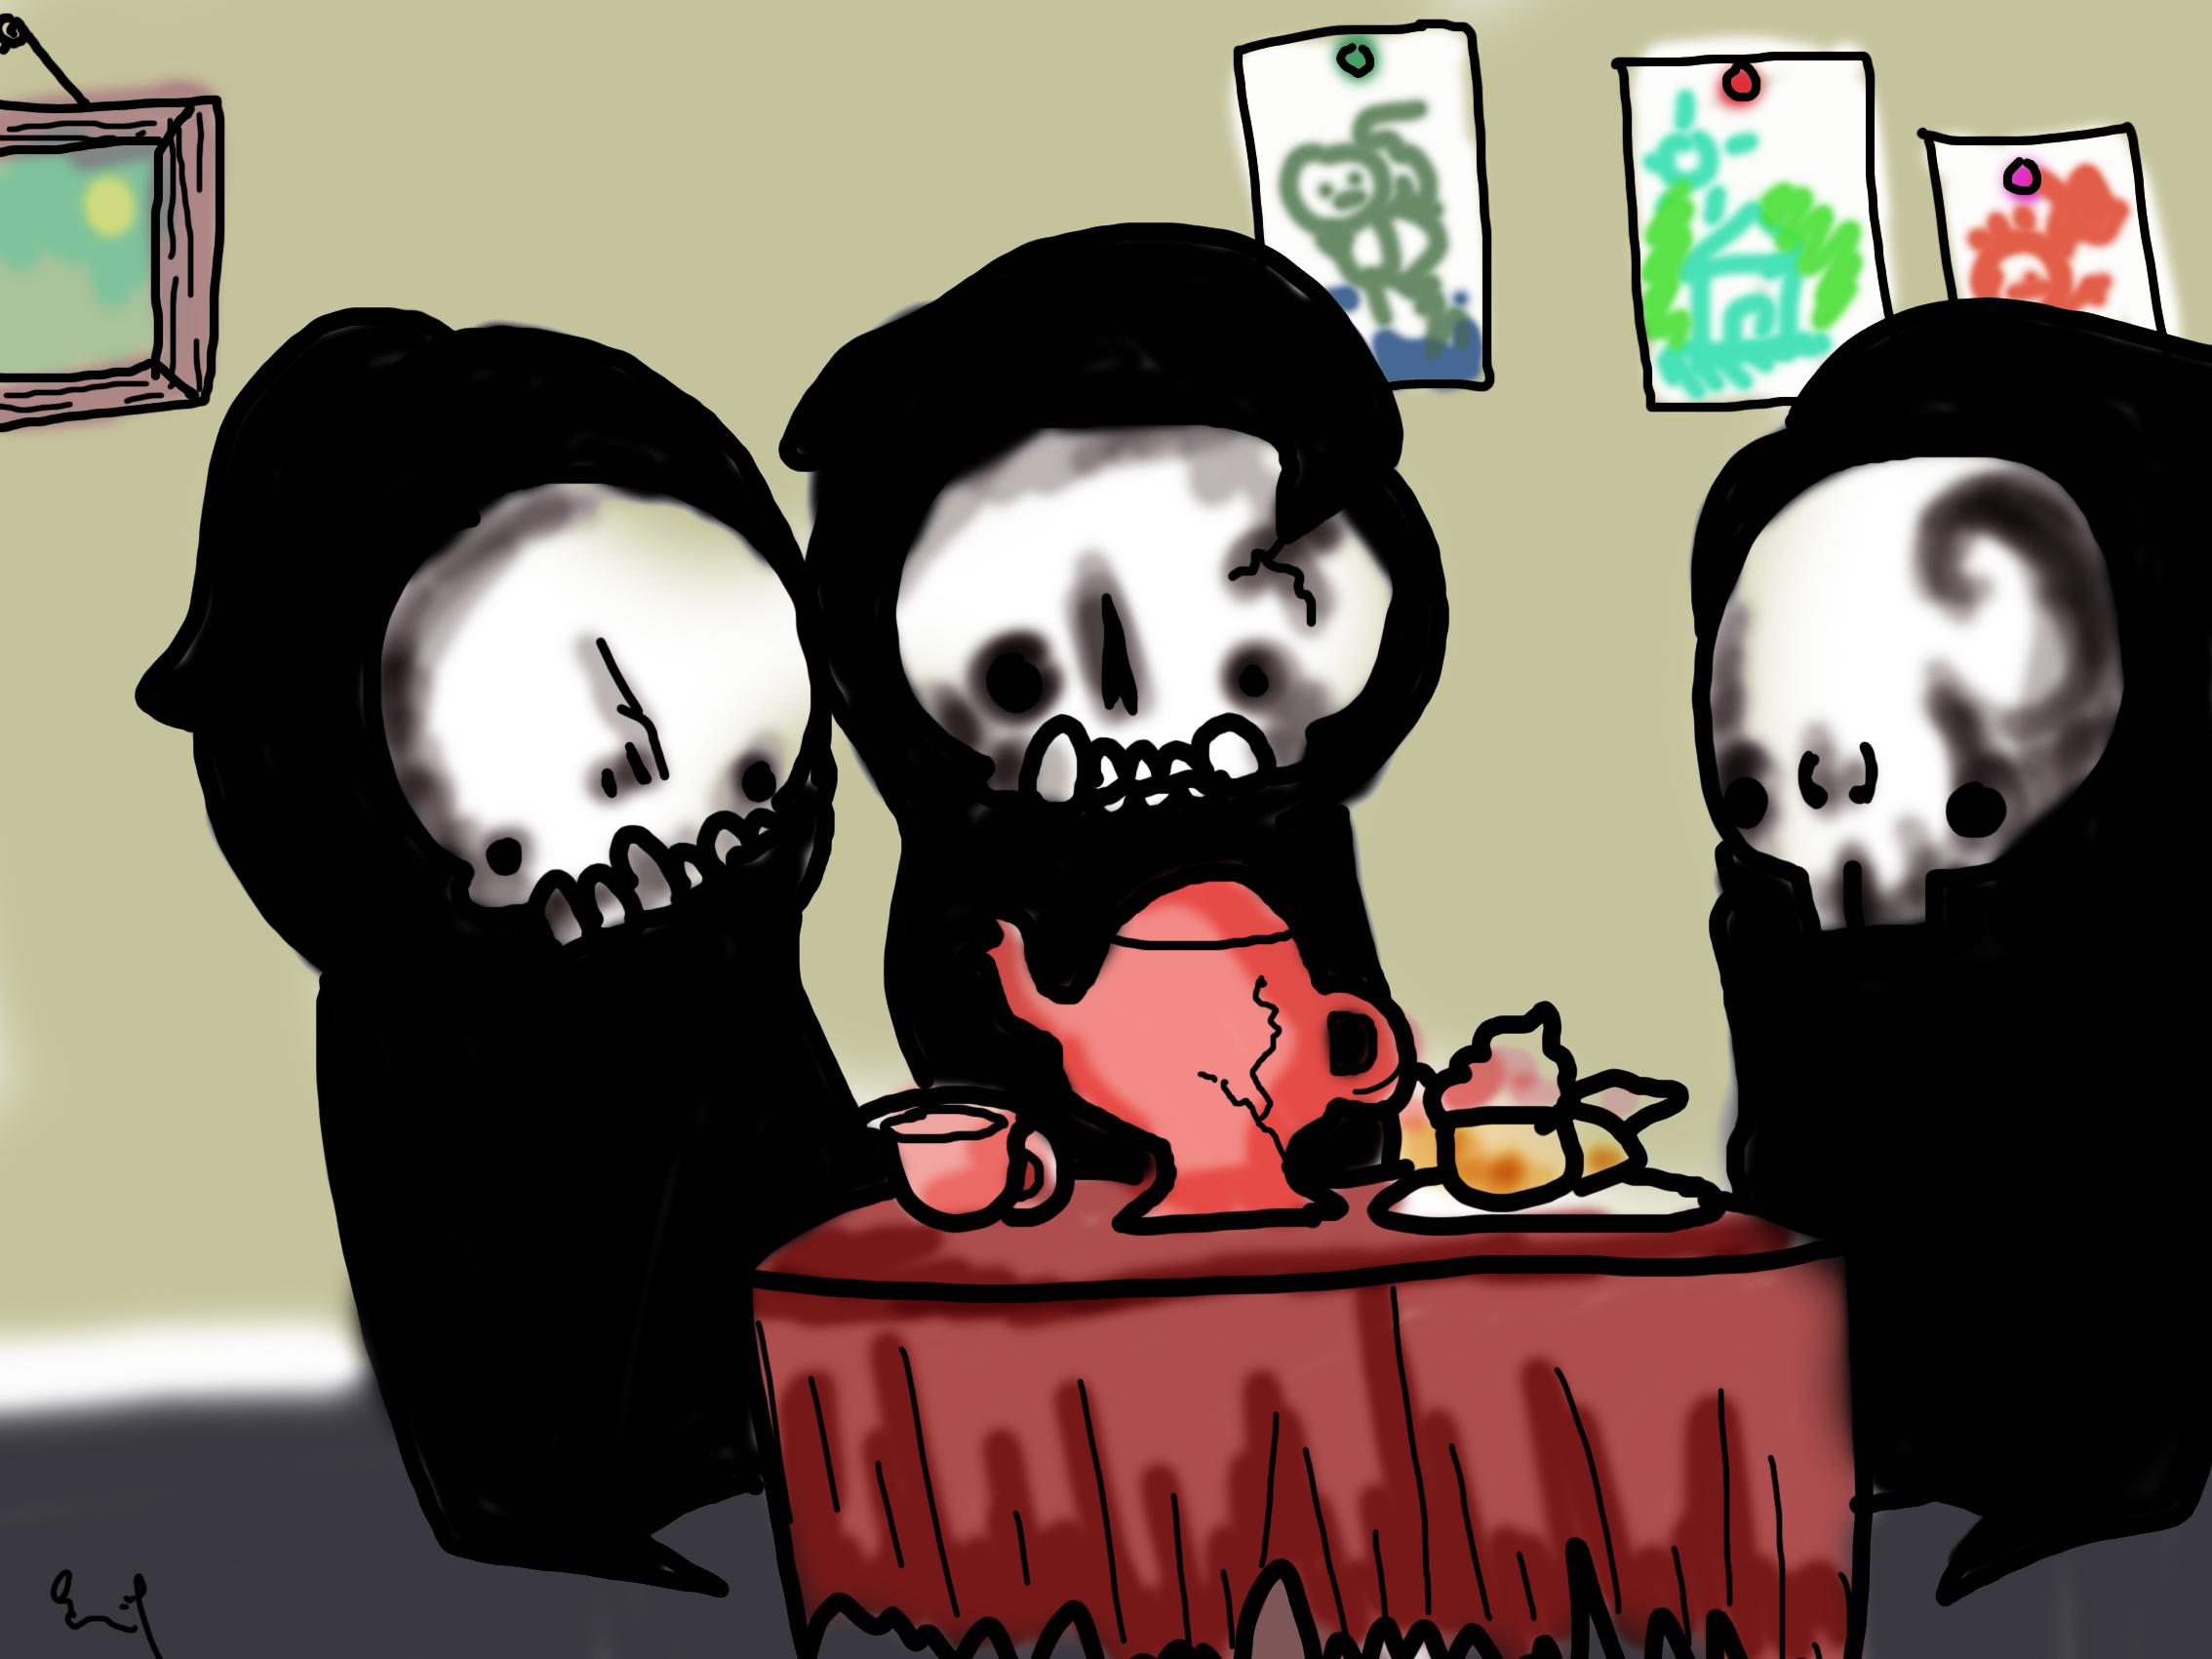 Death has kids